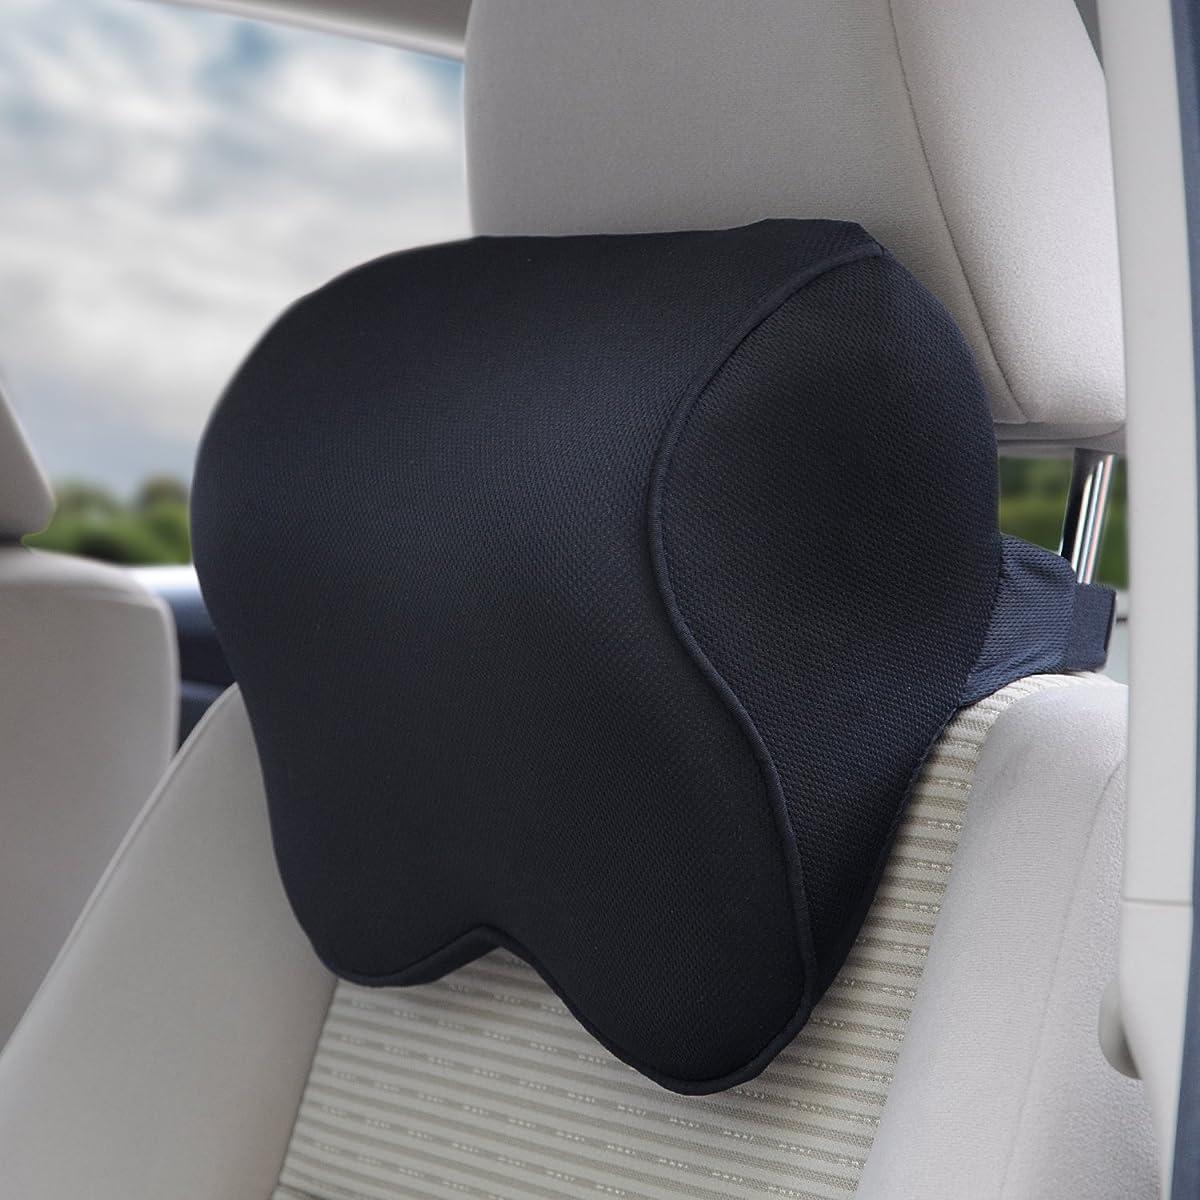 Dreamer Car Mid-hard Memory Foam Car Seat Head Pillow Neck Pillow With Adjustable Elastic Strap(Black)